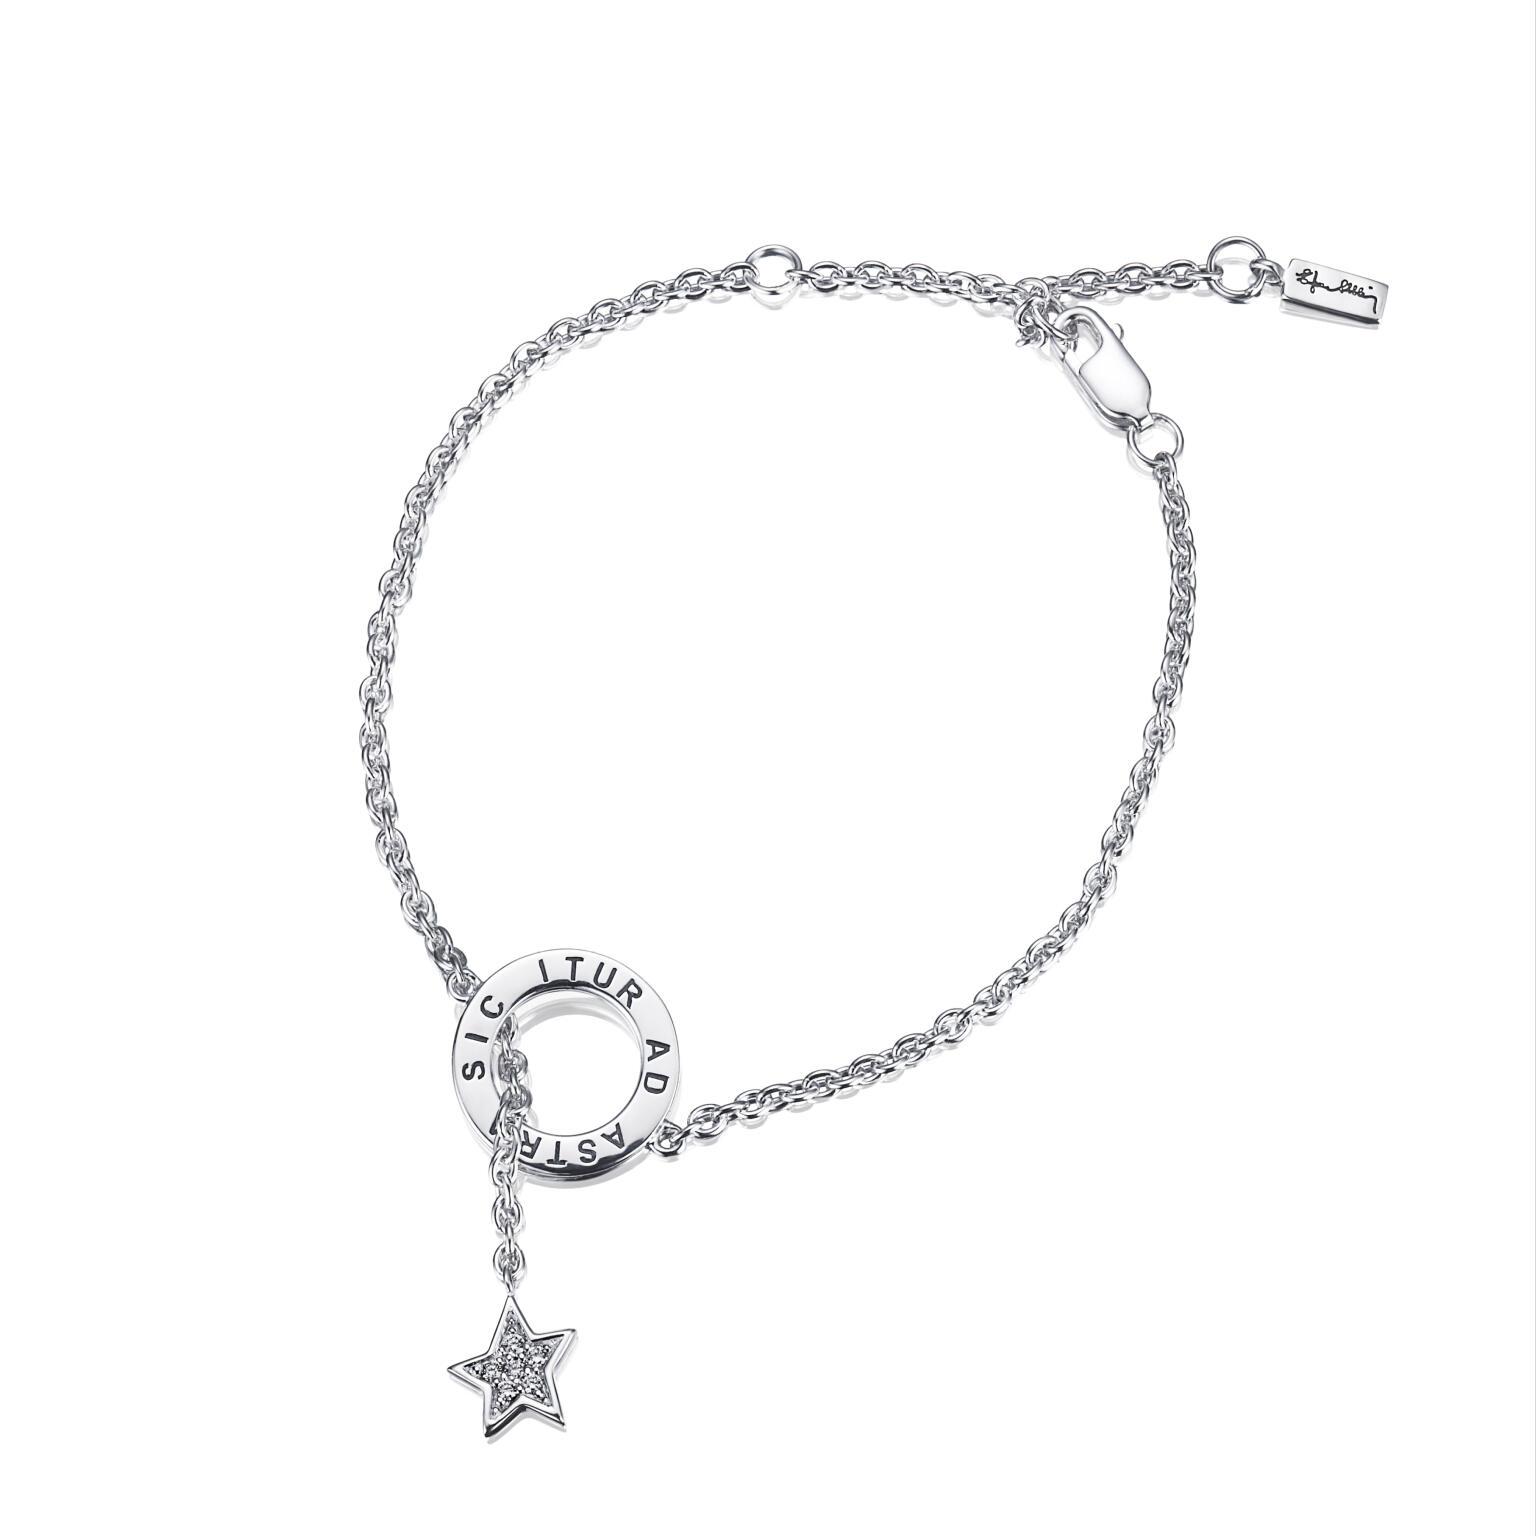 Astra Fall & Stars Bracelet – Silver